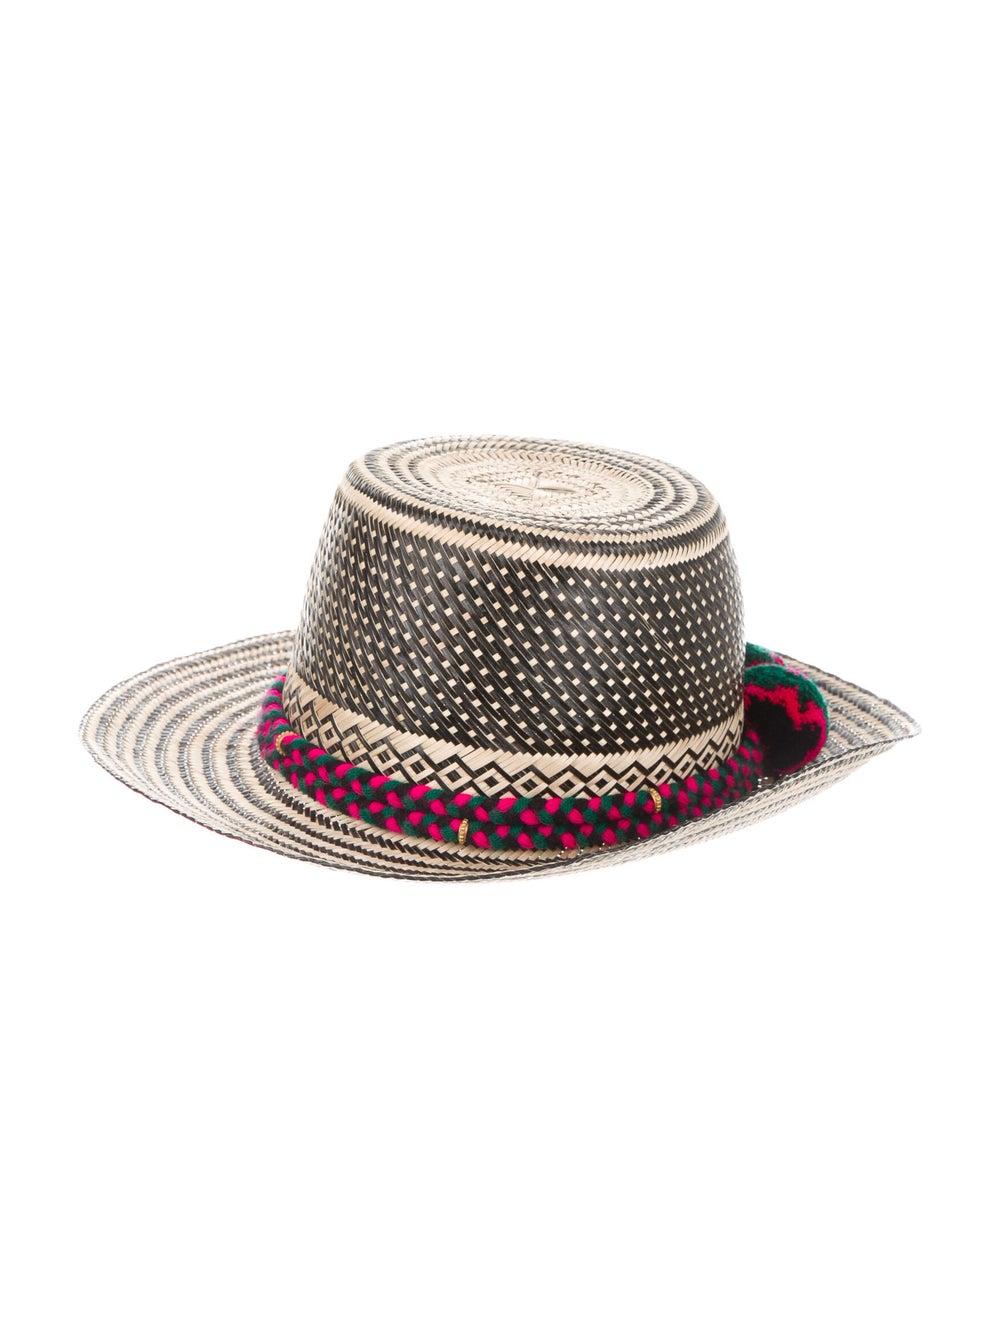 Yosuzi Straw Wide Brim Hat Tan - image 1